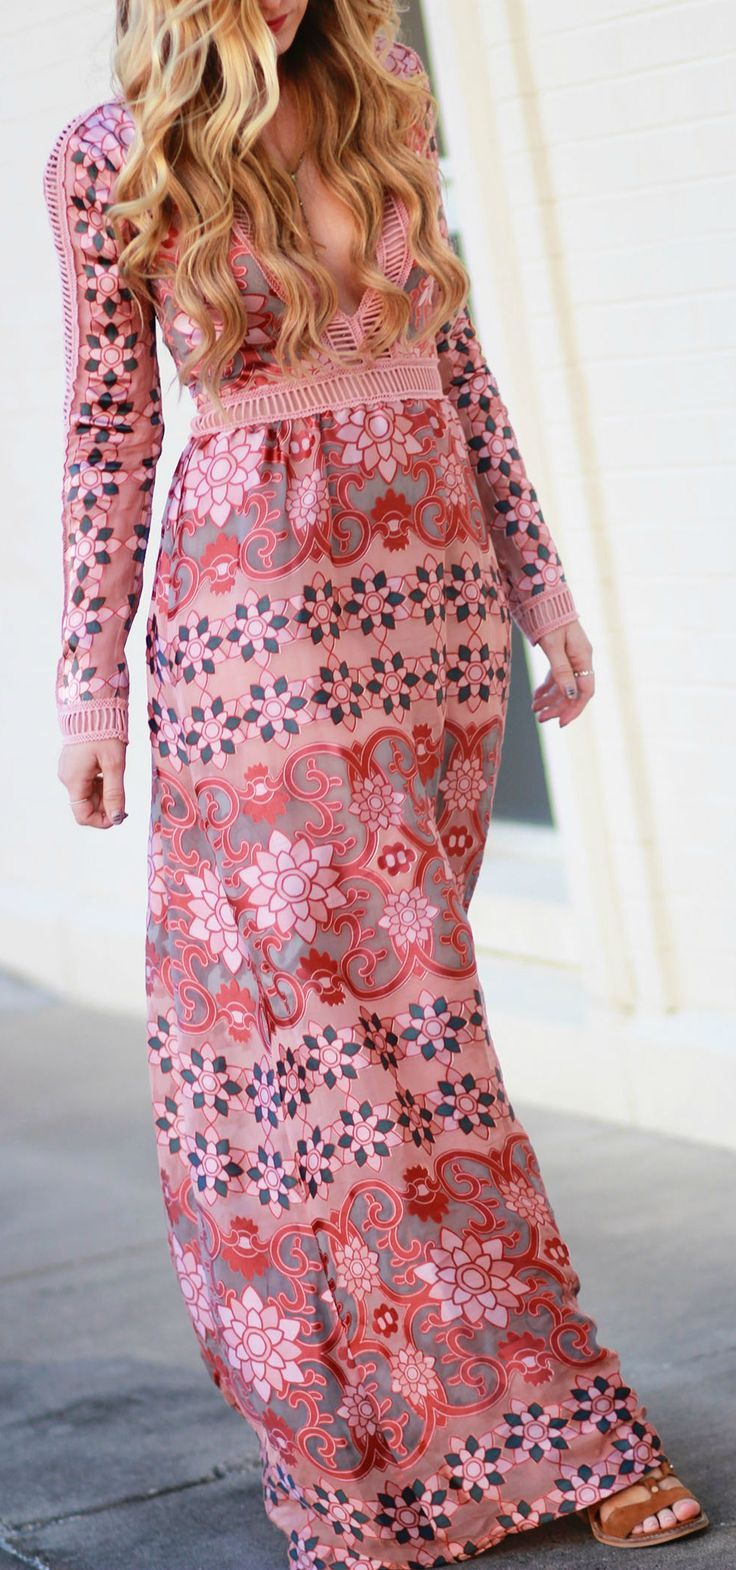 Boho Fall Maxi Dress